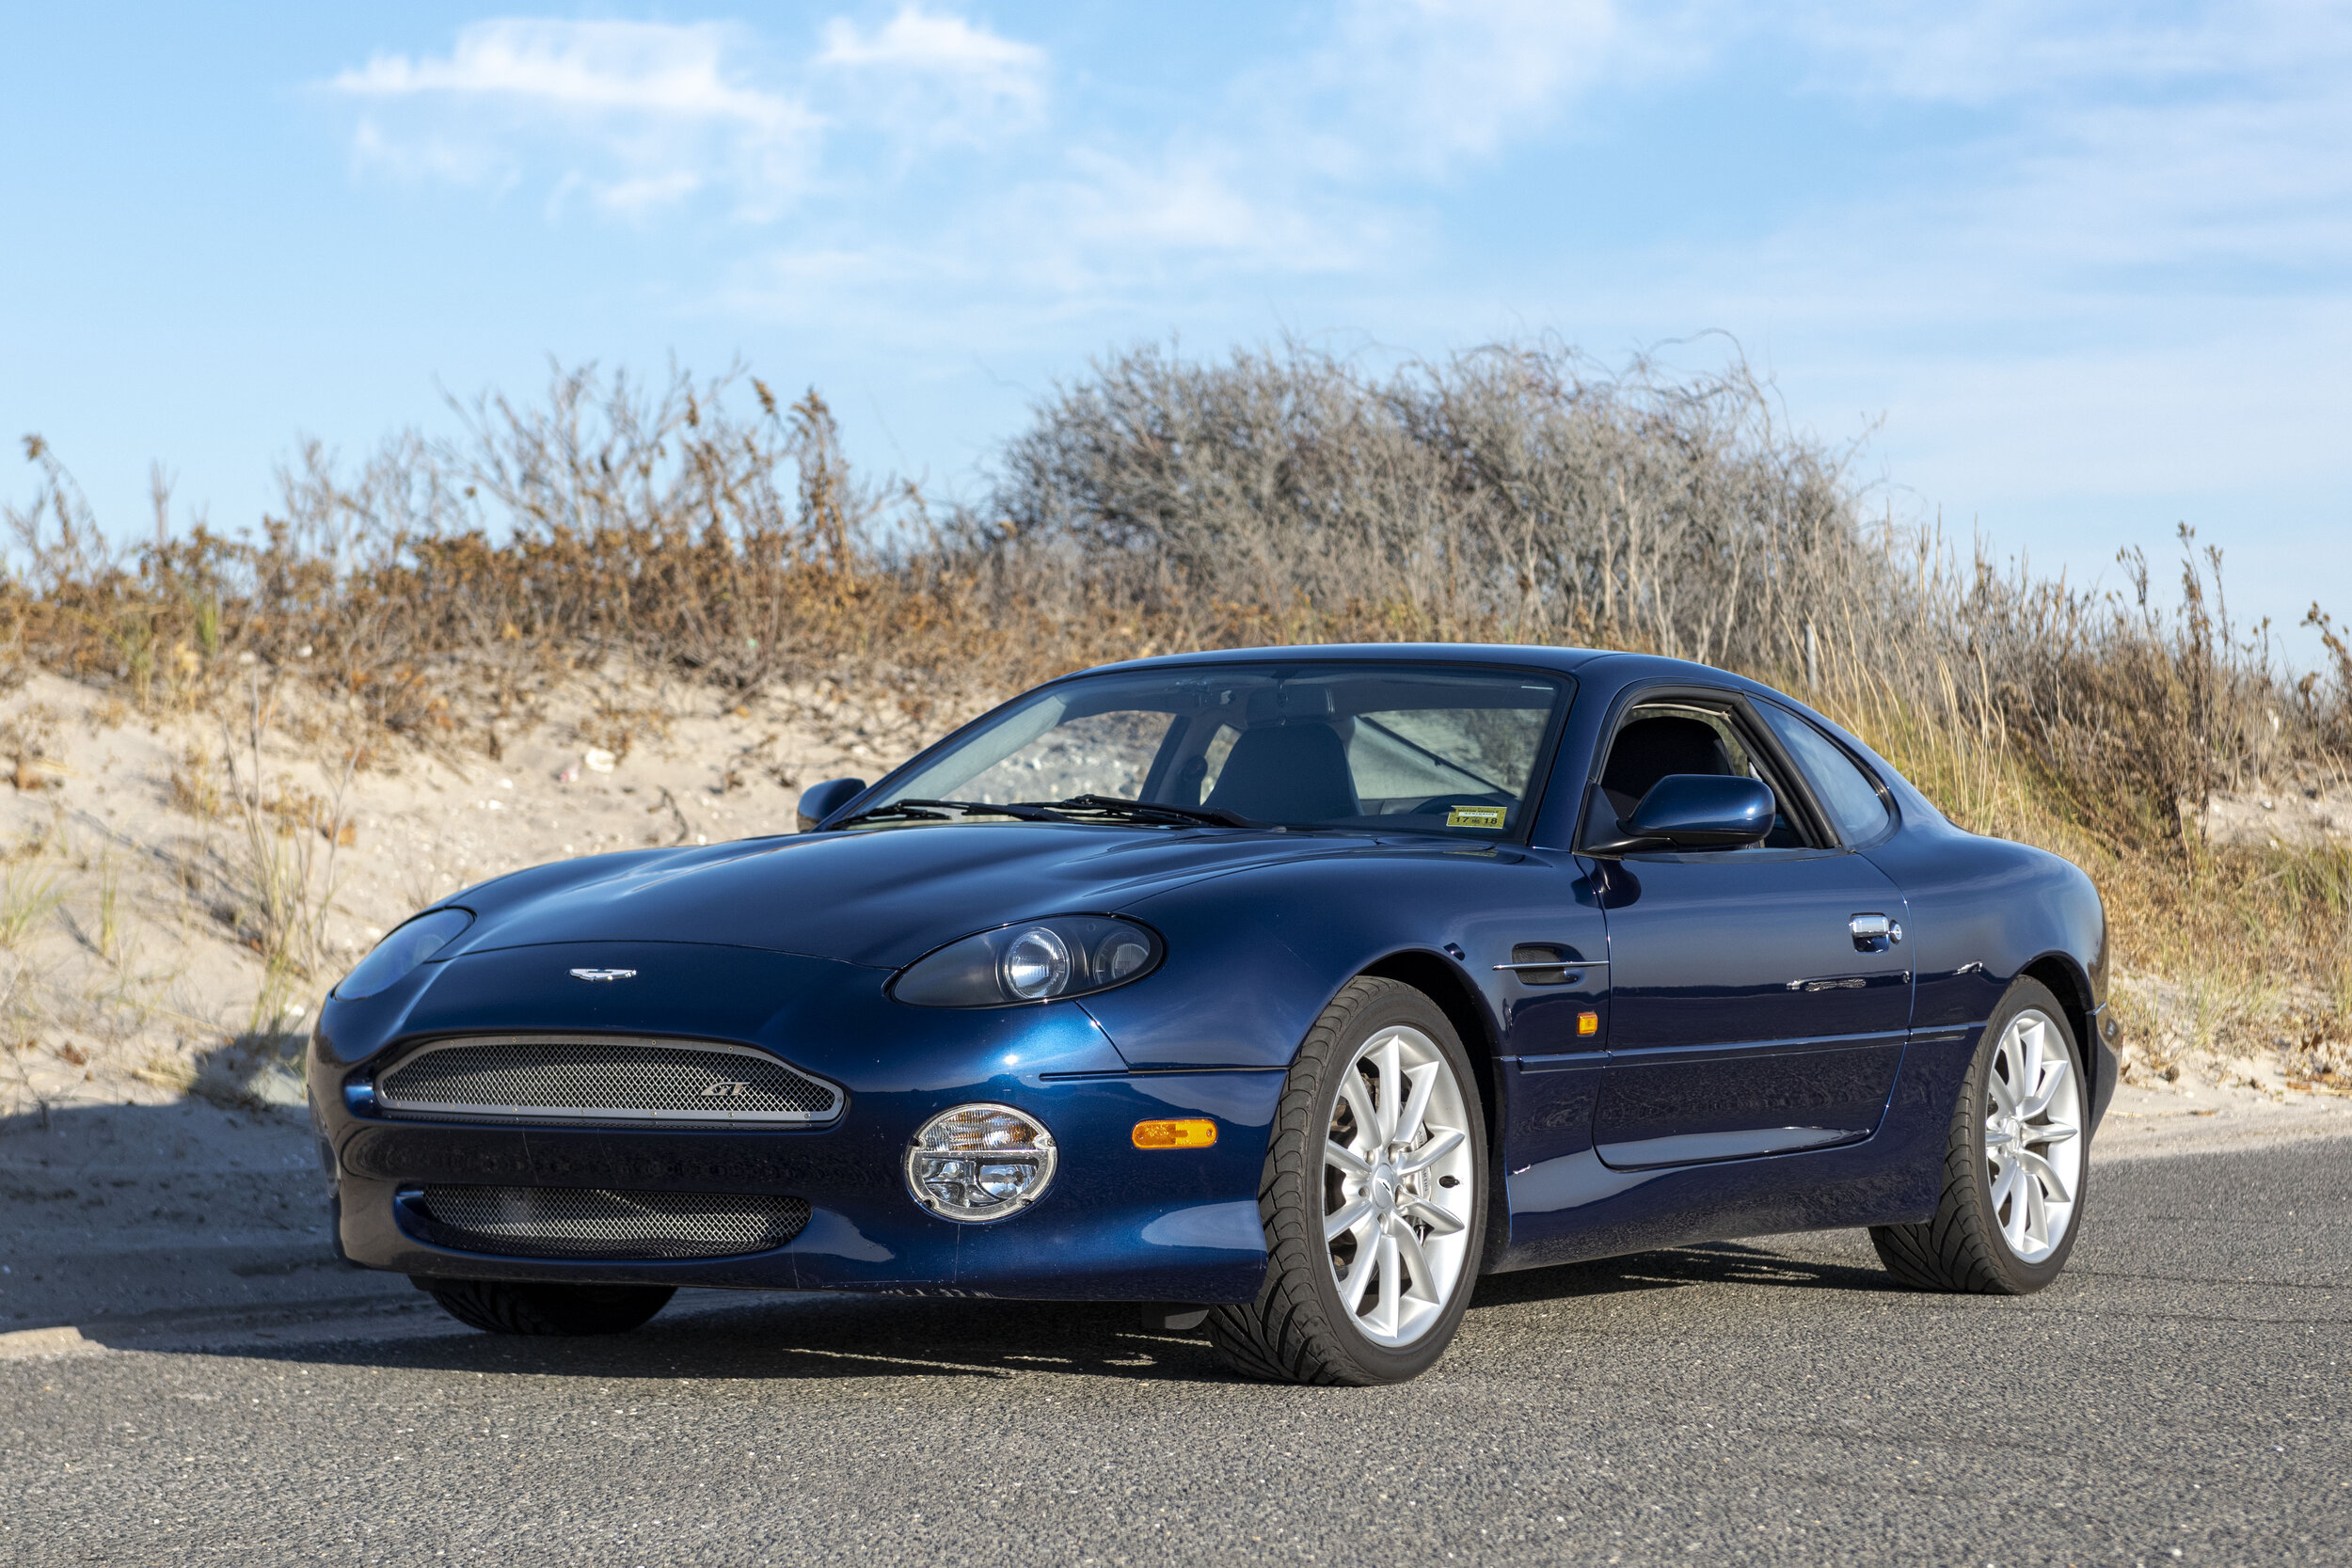 2003 Aston Martin Db7 V12 Gt For Sale Automotive Restorations Inc Automotive Restorations Inc